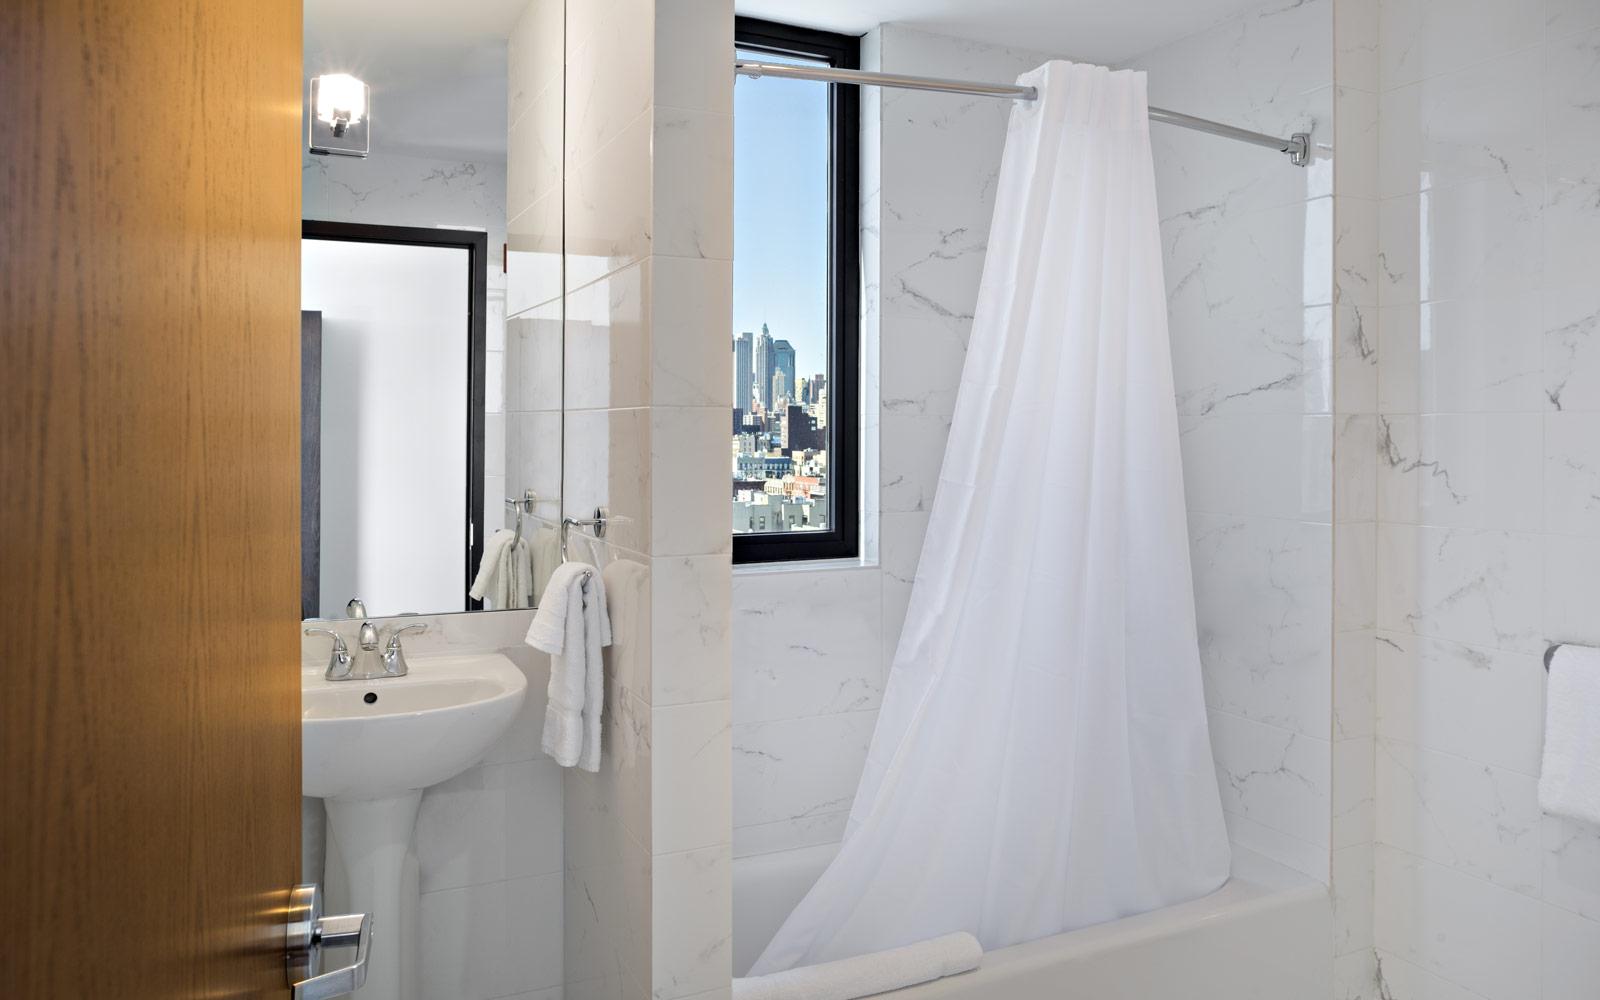 Orchard_St_Hotel_Bathroom